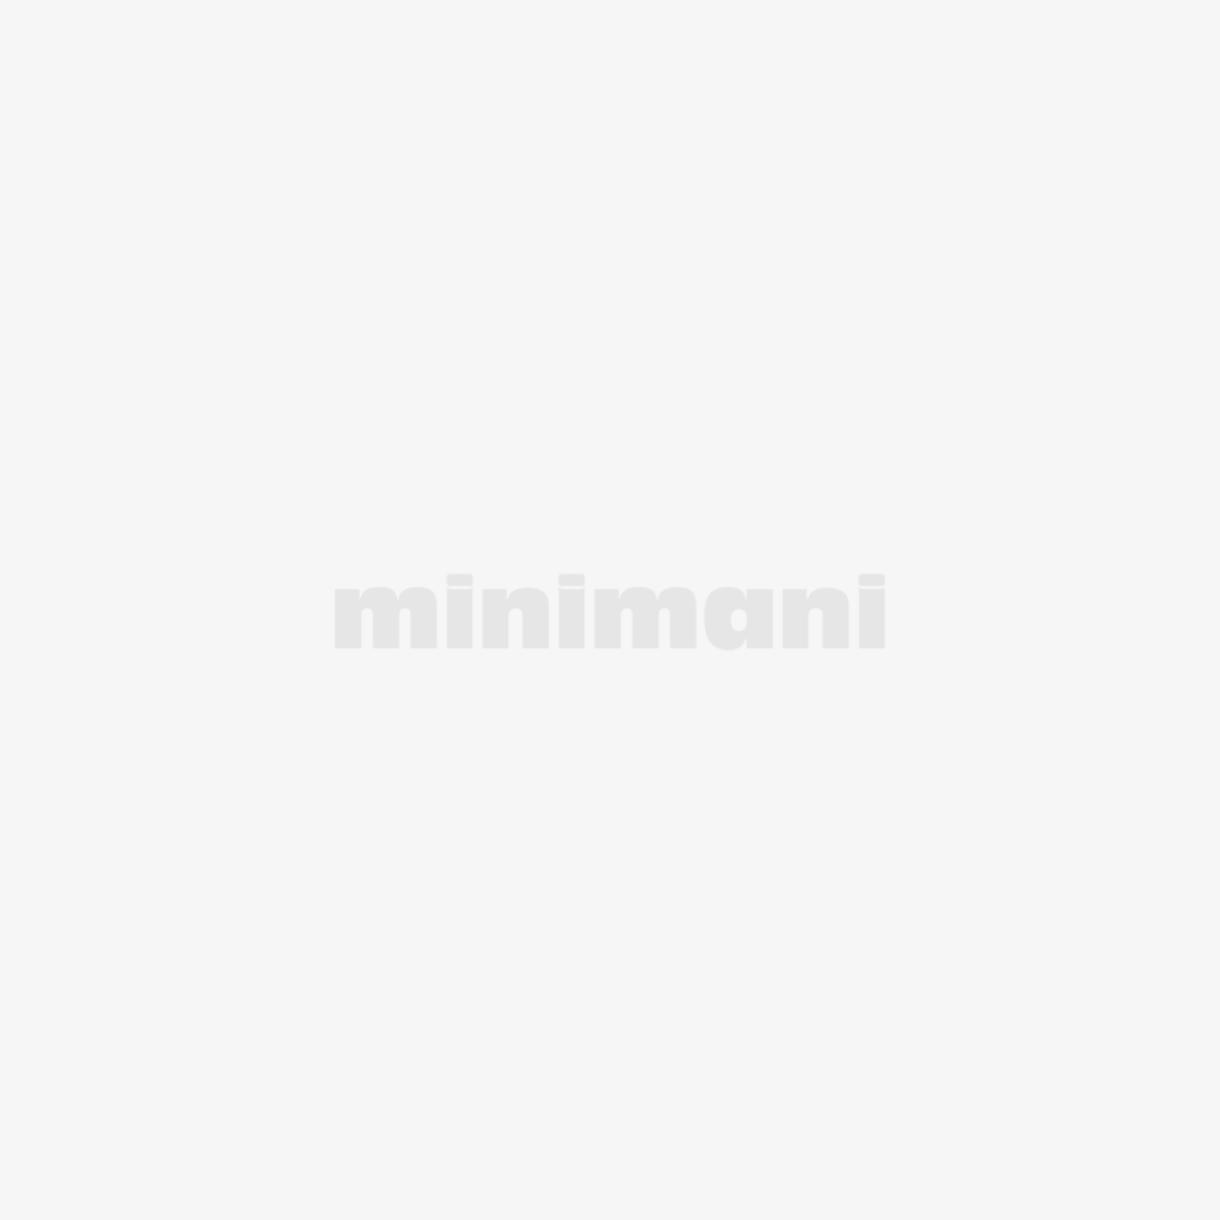 PPC SENIOR/LIGHT KISSAN TÄYSRAVINTO 750G 750 G